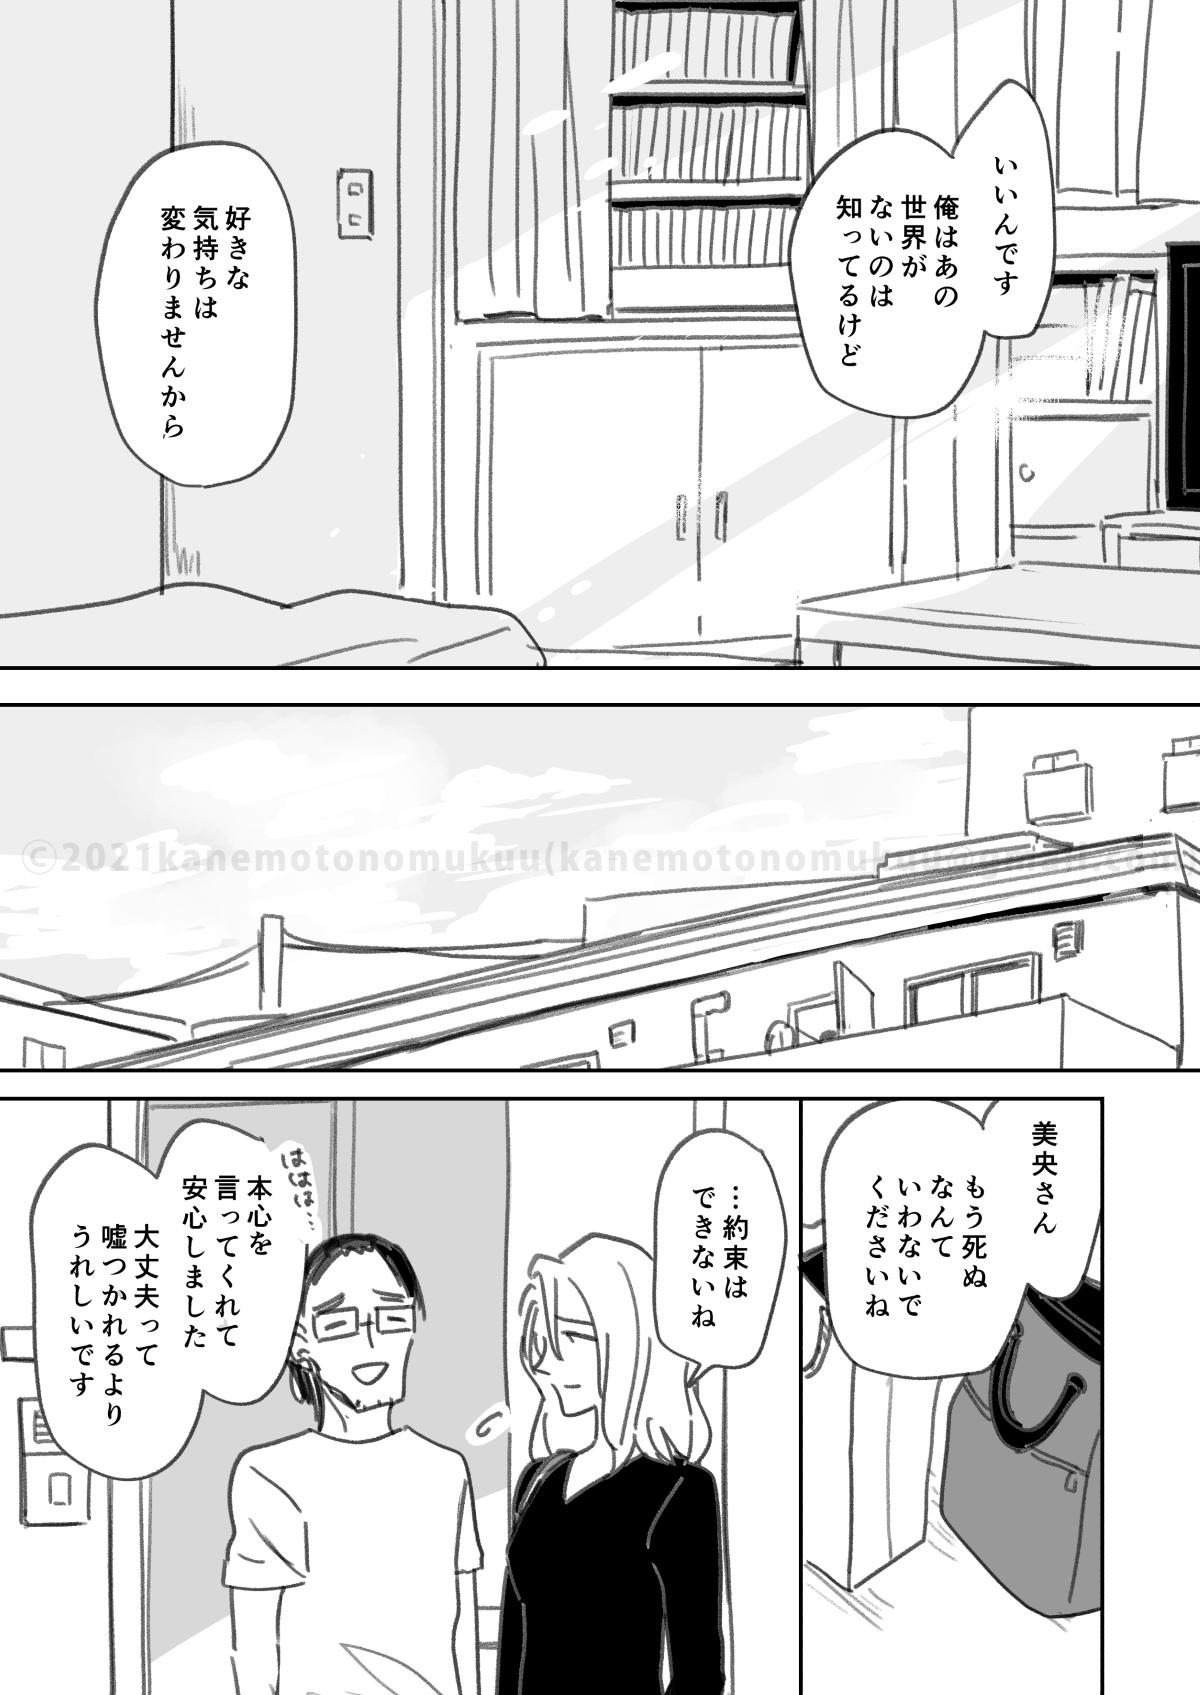 f:id:kanemotonomukuu:20210131100936j:plain